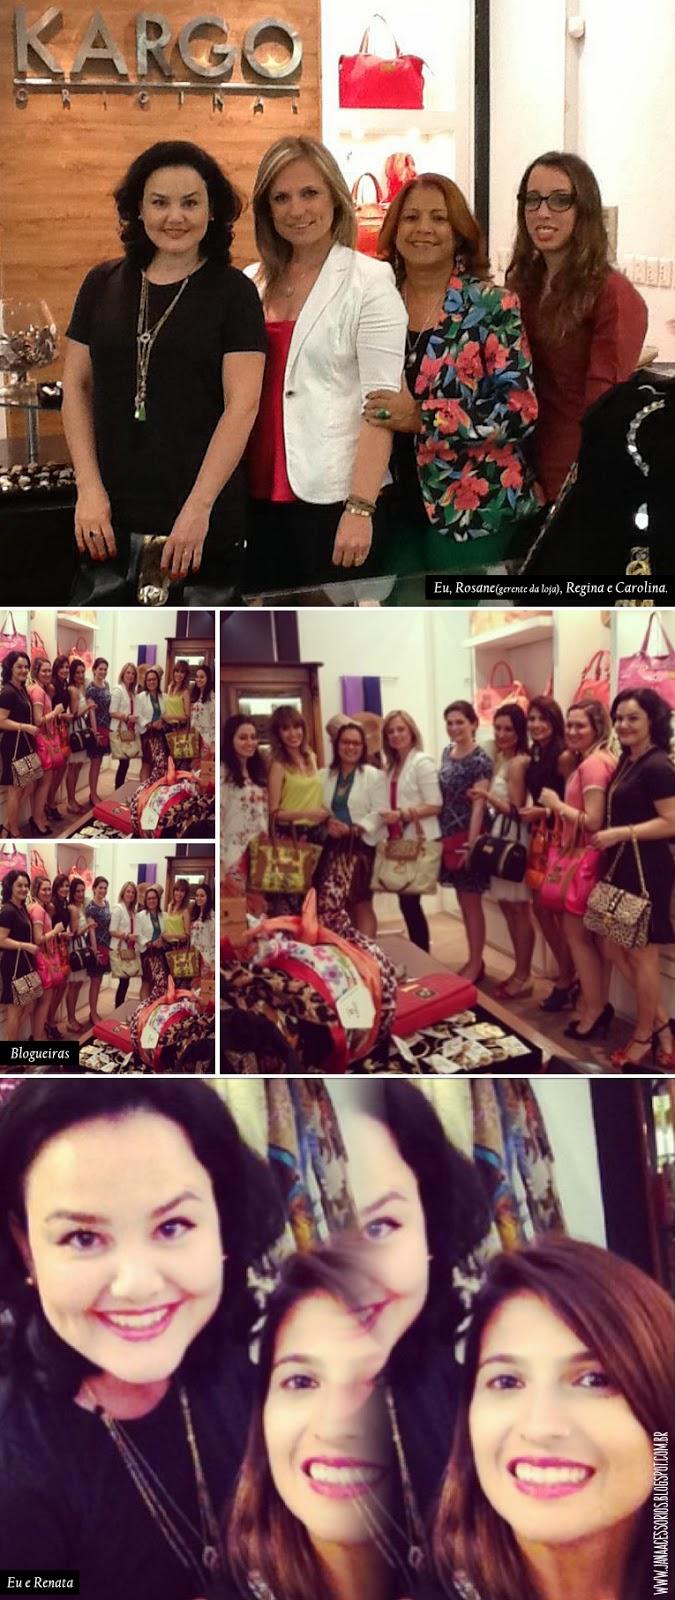 Kargo, Joinville, Blogueira, Bloggers